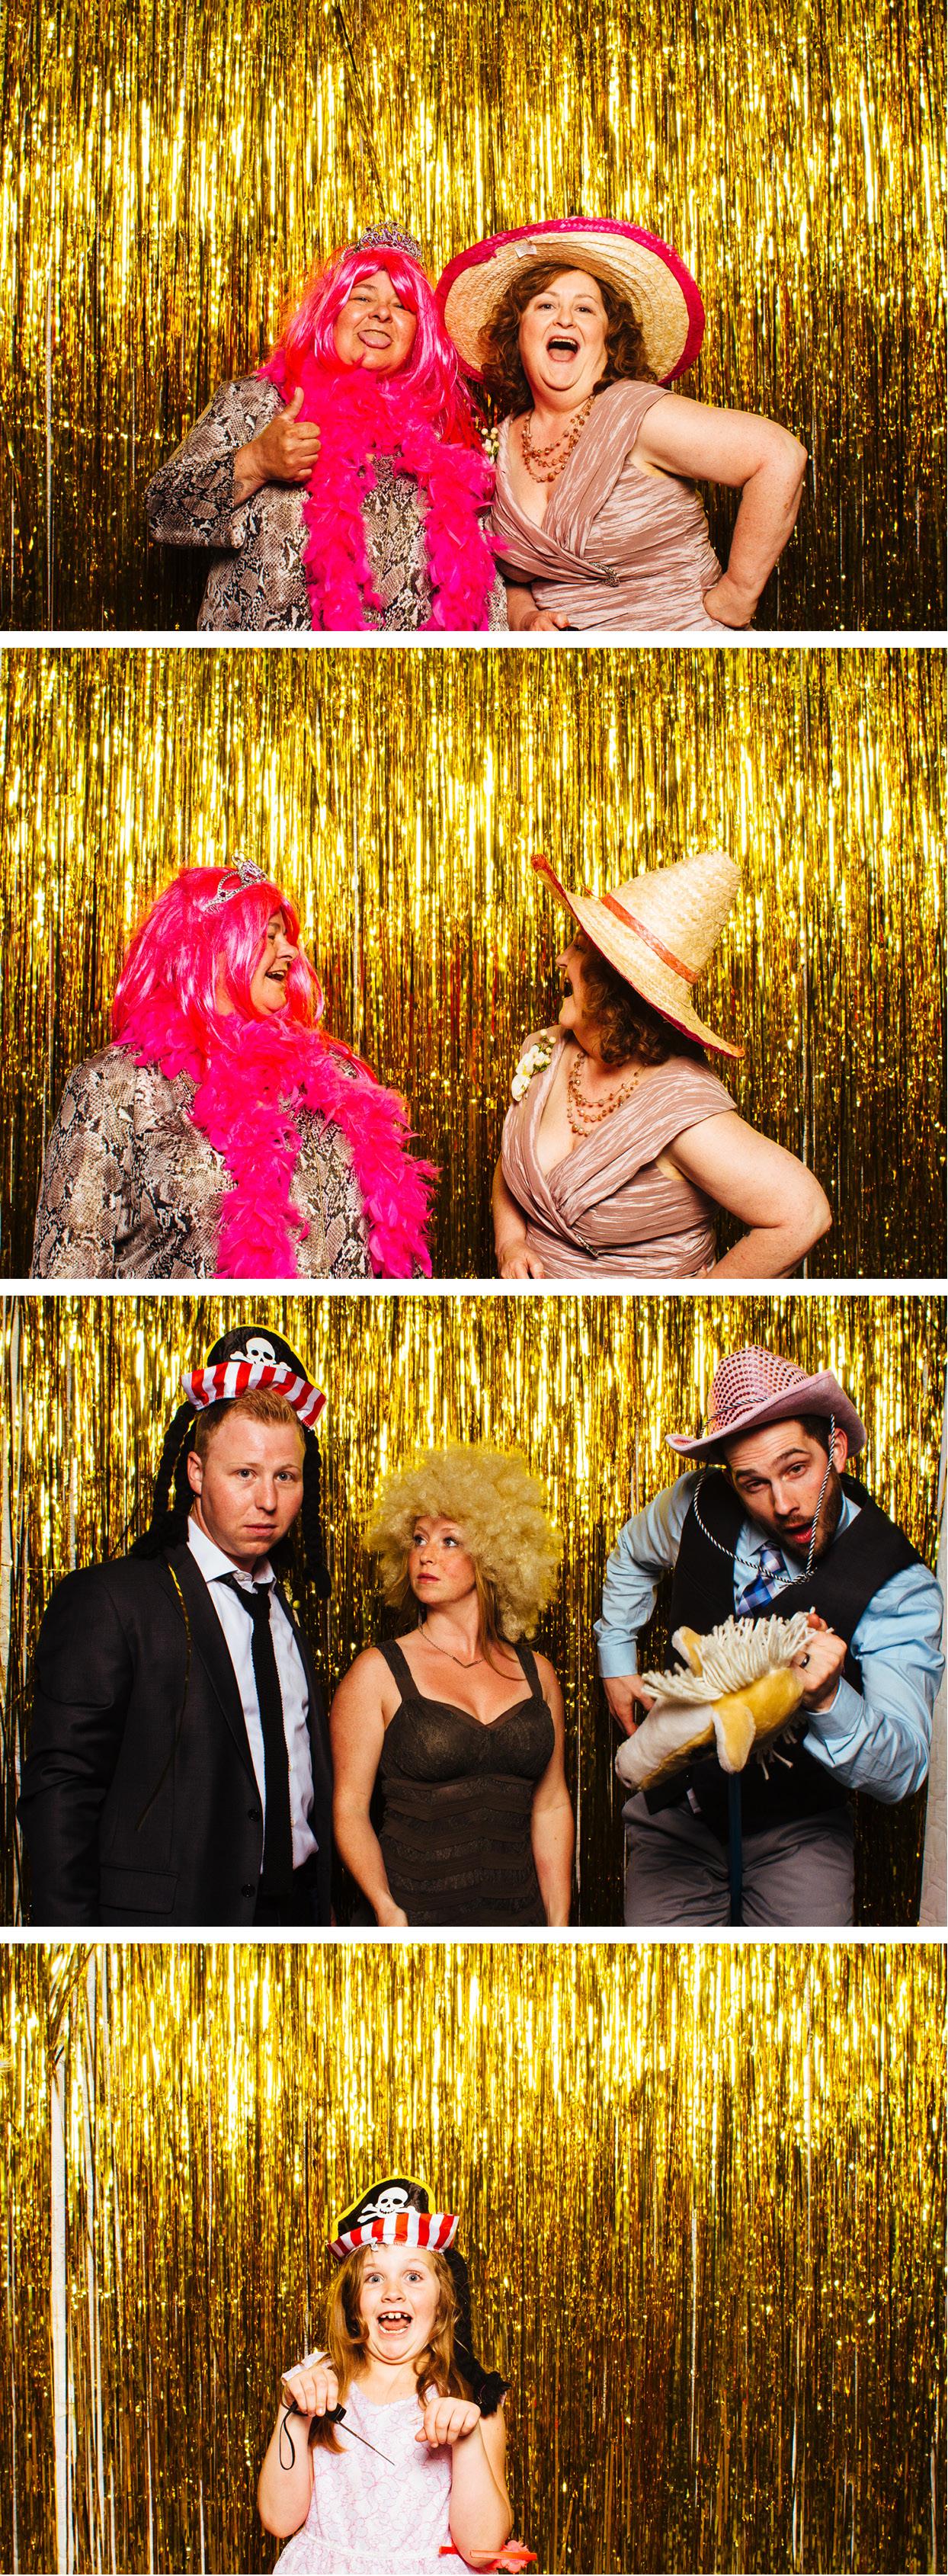 CK-Photo-Nashville-Wedding-Photographer-Photobooth-DL3.jpg